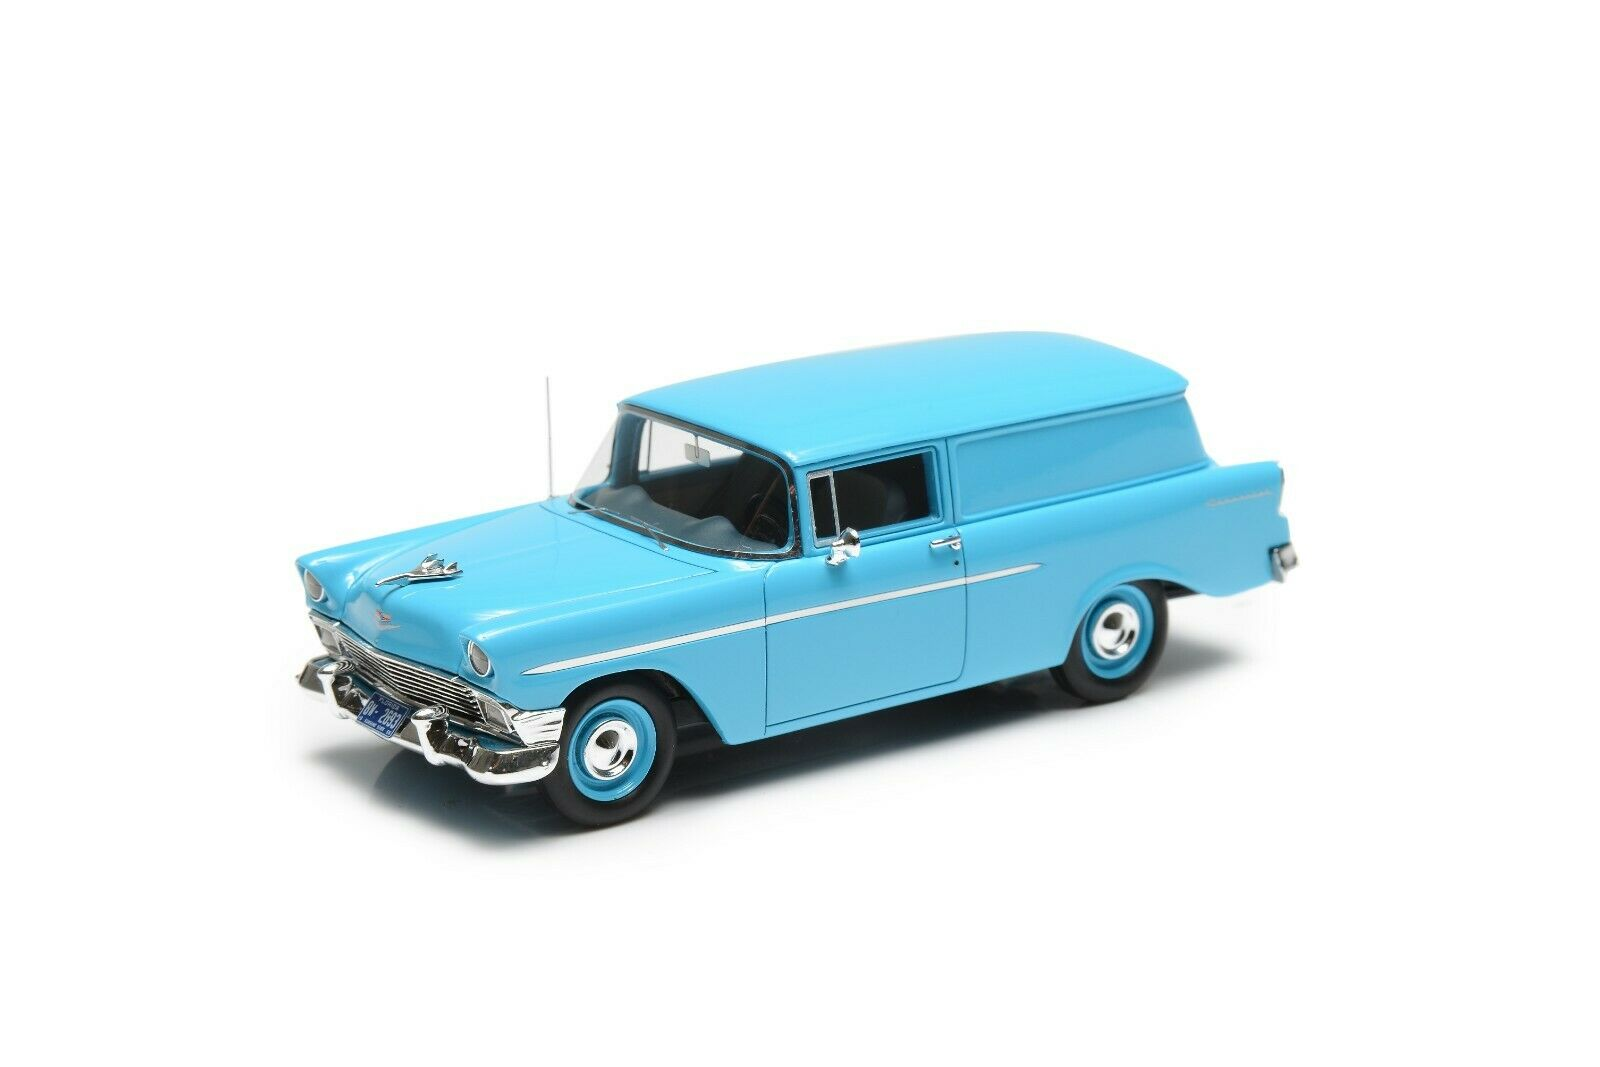 seguro de calidad Esval Modelos 1956 Chevrolet 150 Handyman Panel Panel Panel entrega-Azul 1 43 modelo de resina  hasta un 65% de descuento